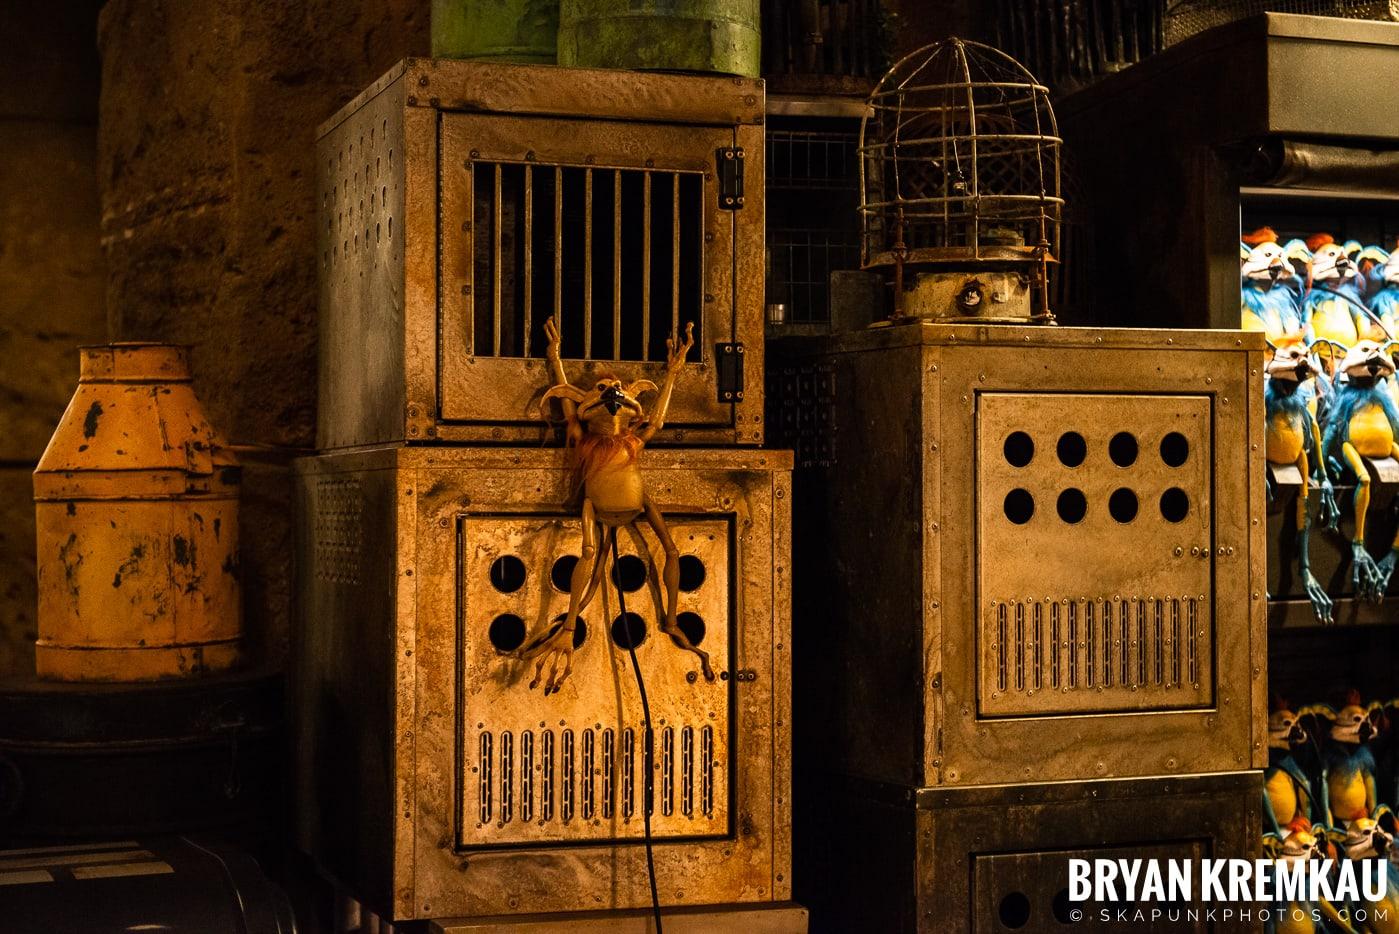 Walt Disney World Vacation: Day 5 (Animal Kingdom / Disney's Hollywood Studios) - 10.3.19 (36)